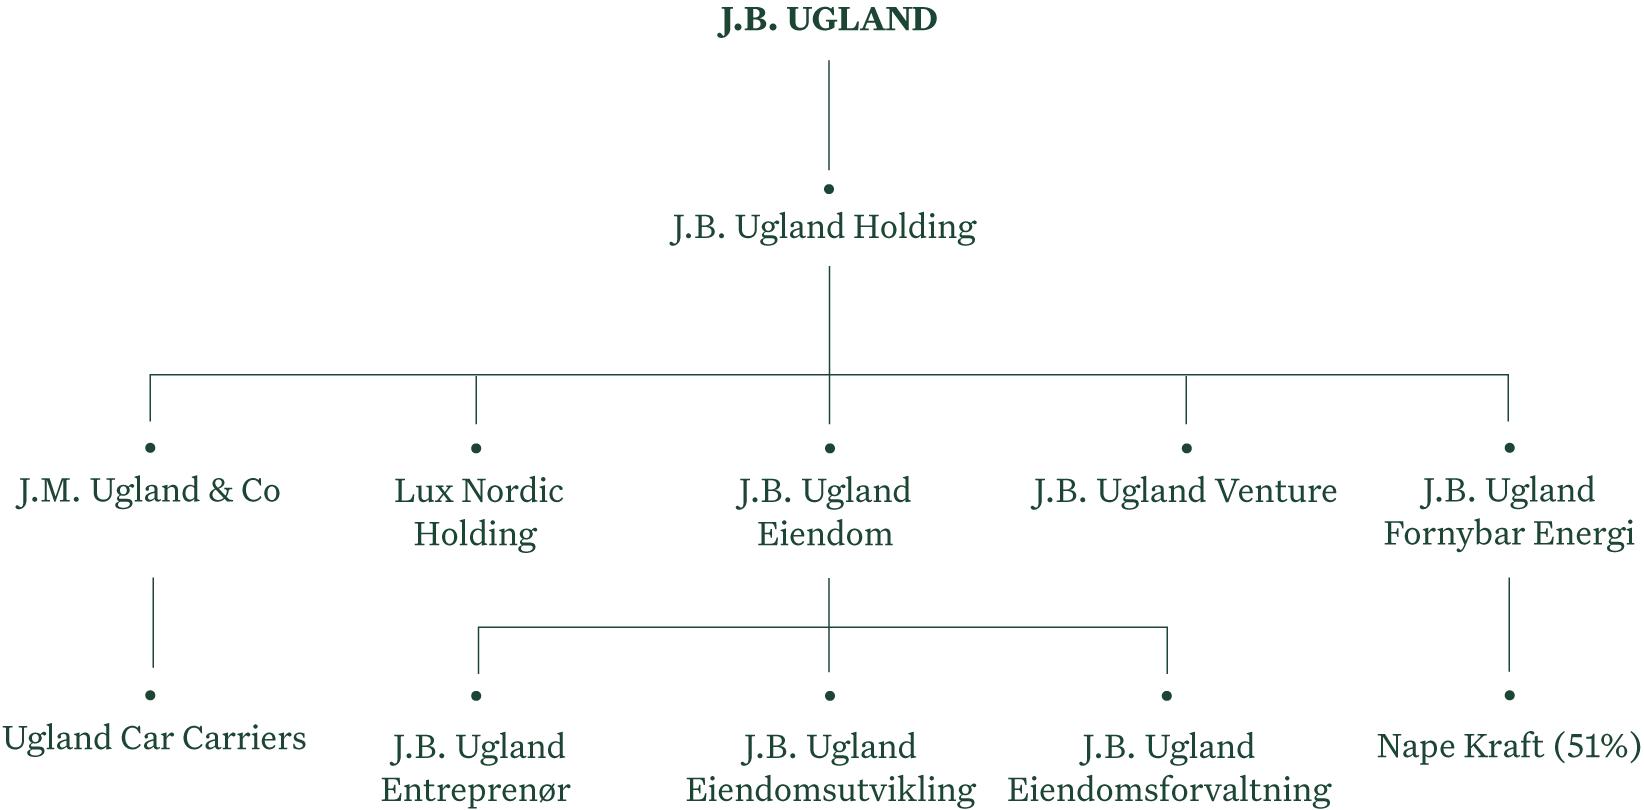 J.B. Ugland selkapsstruktur